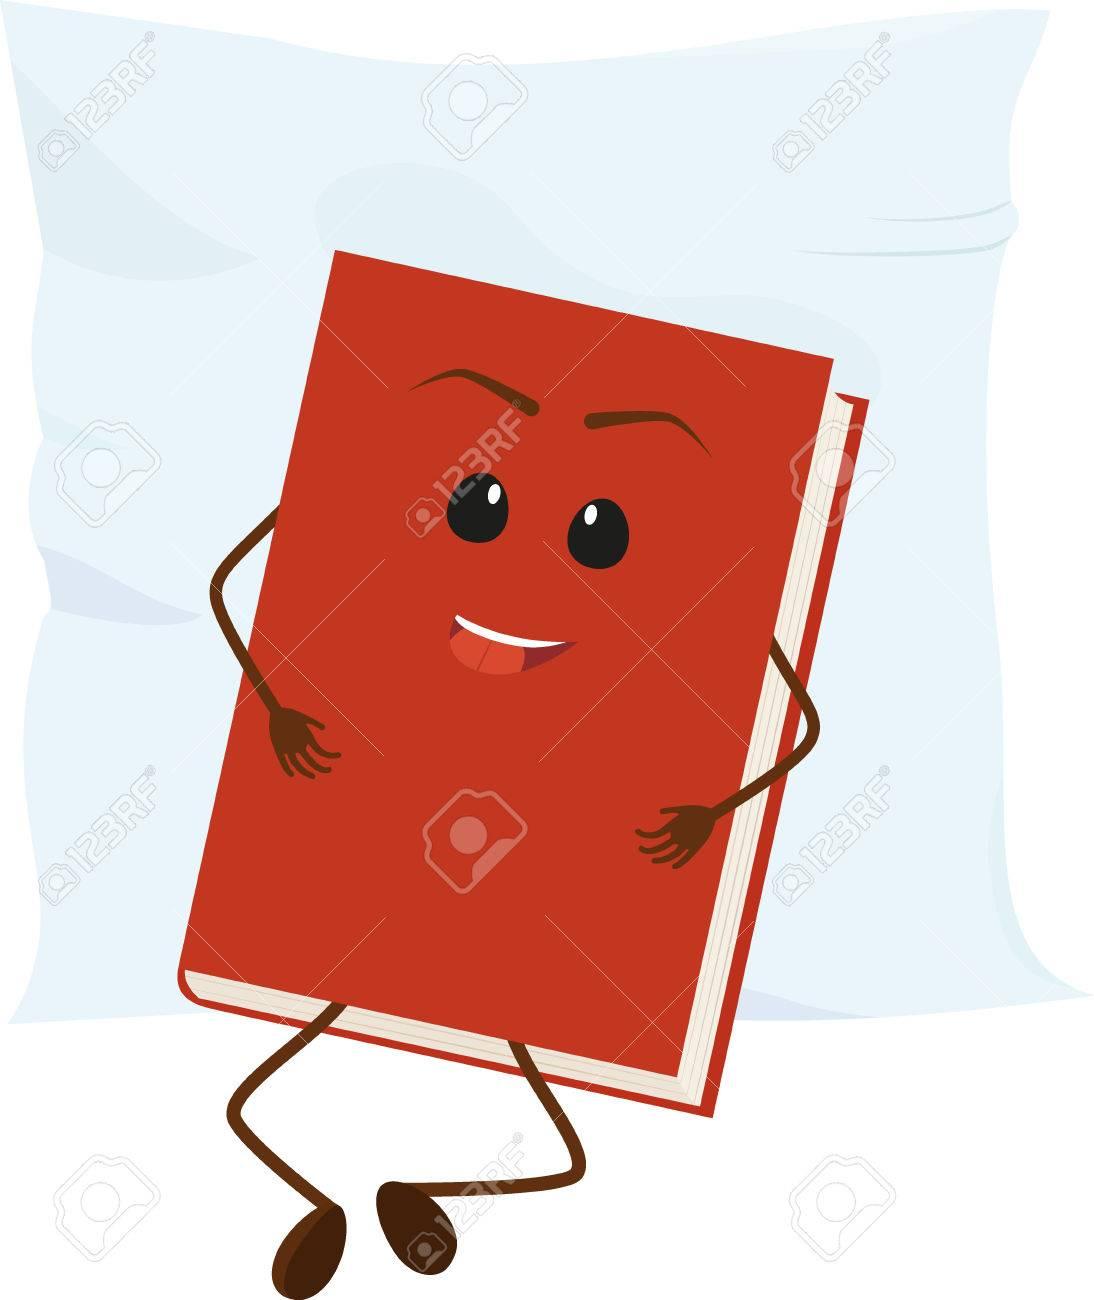 Dessin Anime Livre Rouge Repose Sur L Oreiller